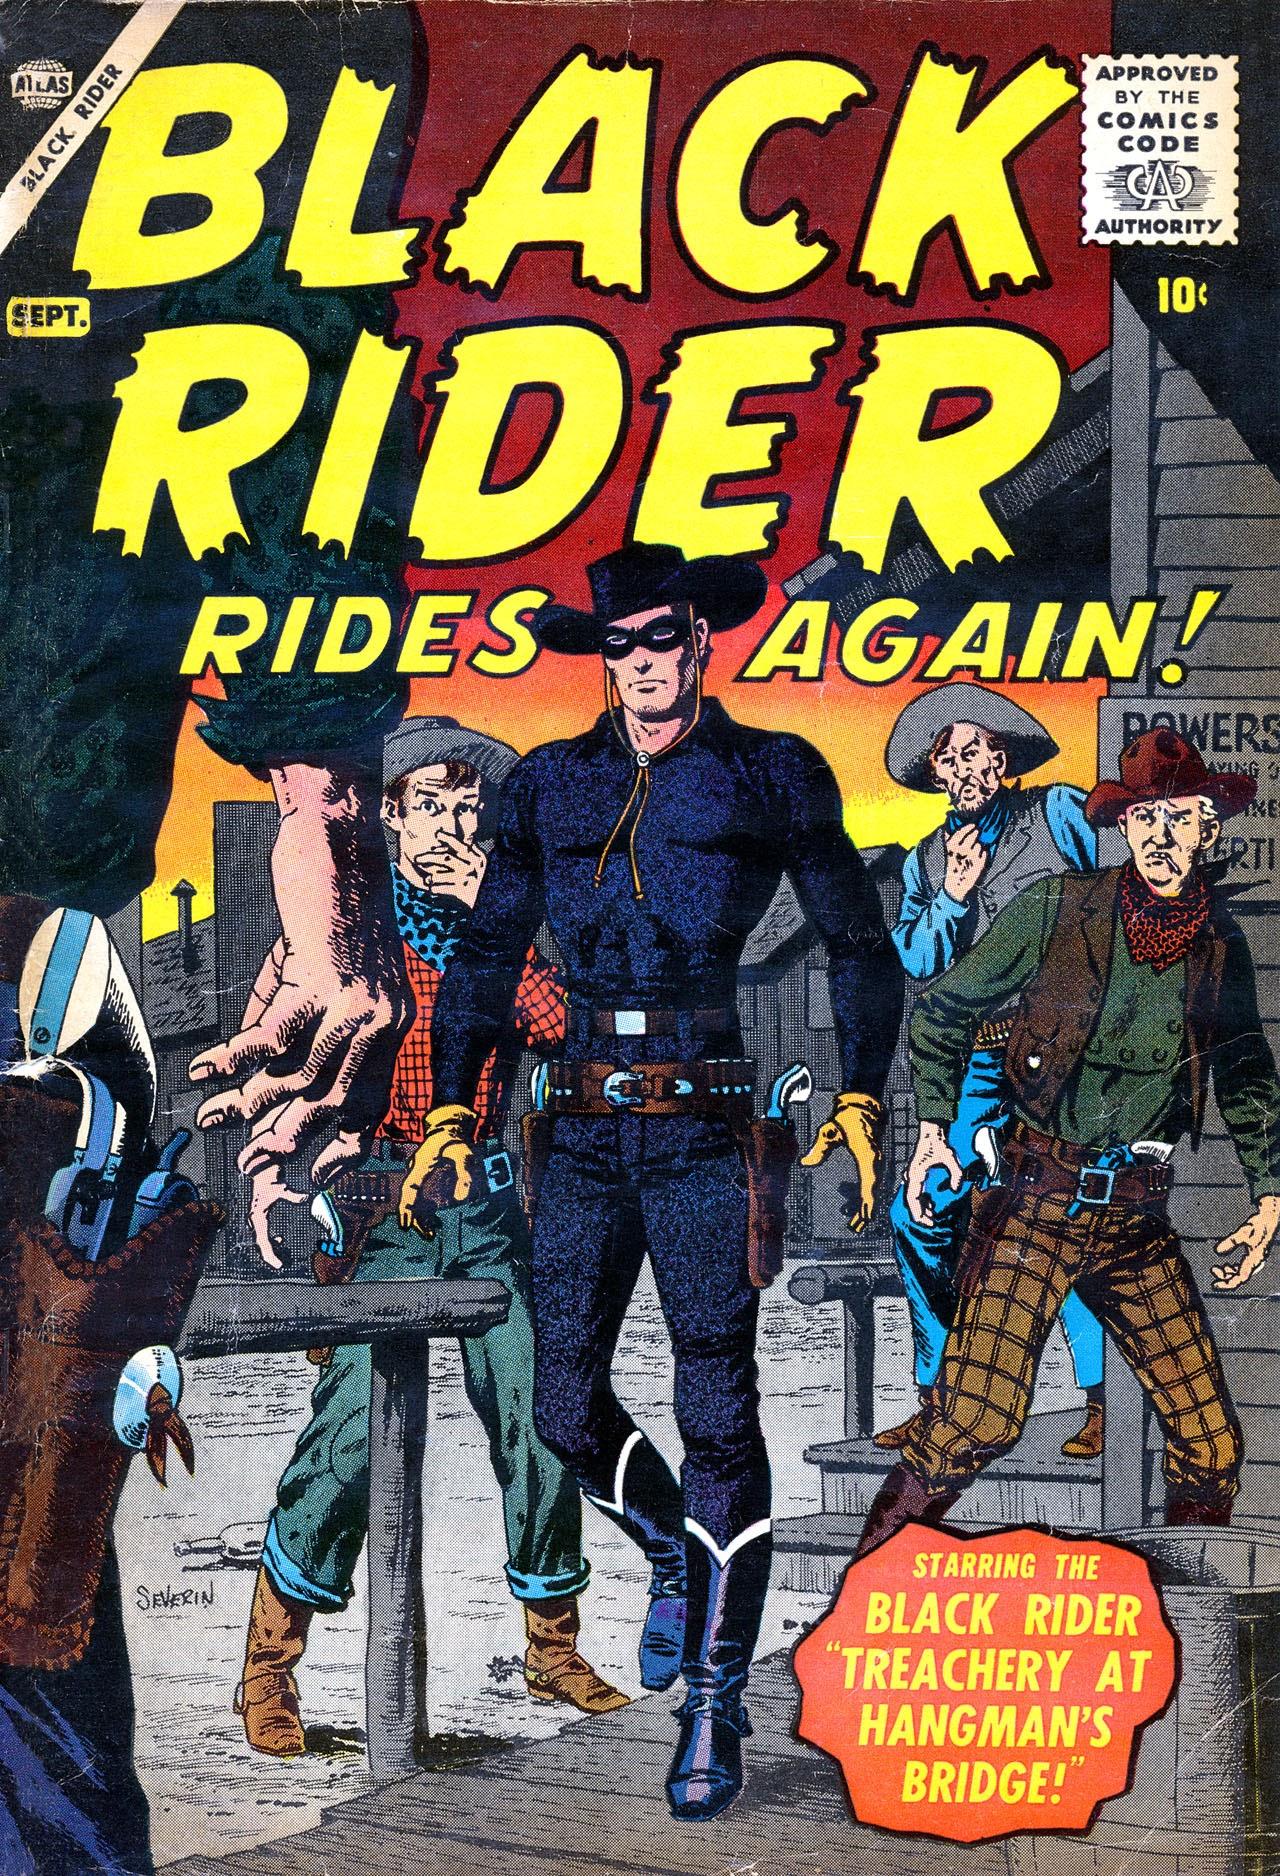 Black Rider Rides Again! Full Page 1